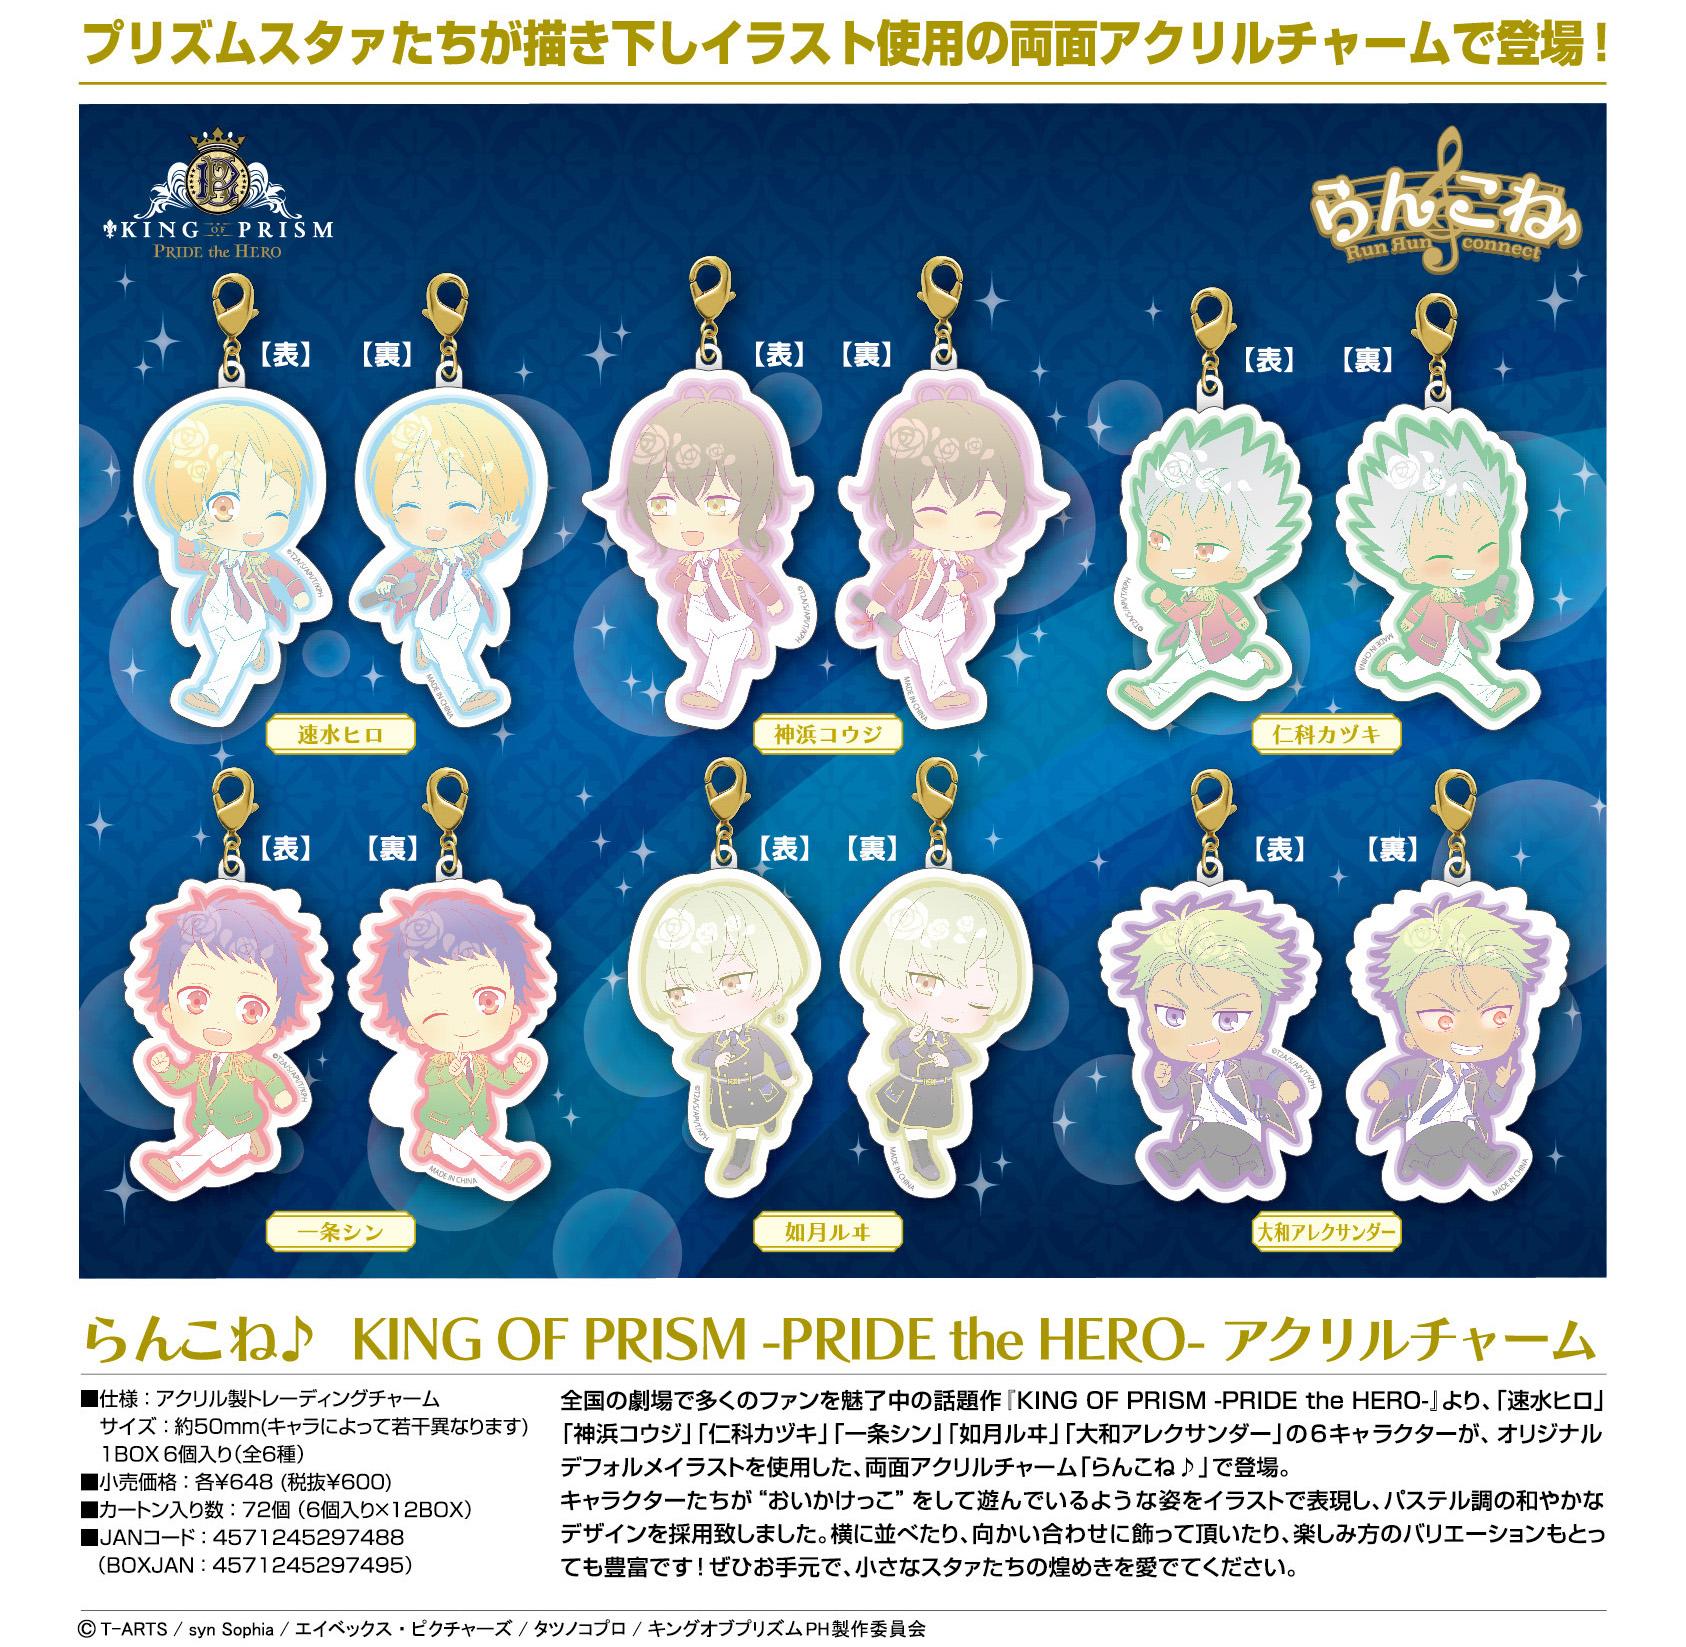 【B】盒蛋 KING OF PRISM -PRIDE the HERO-  双面亚克力挂件 全6种 297495